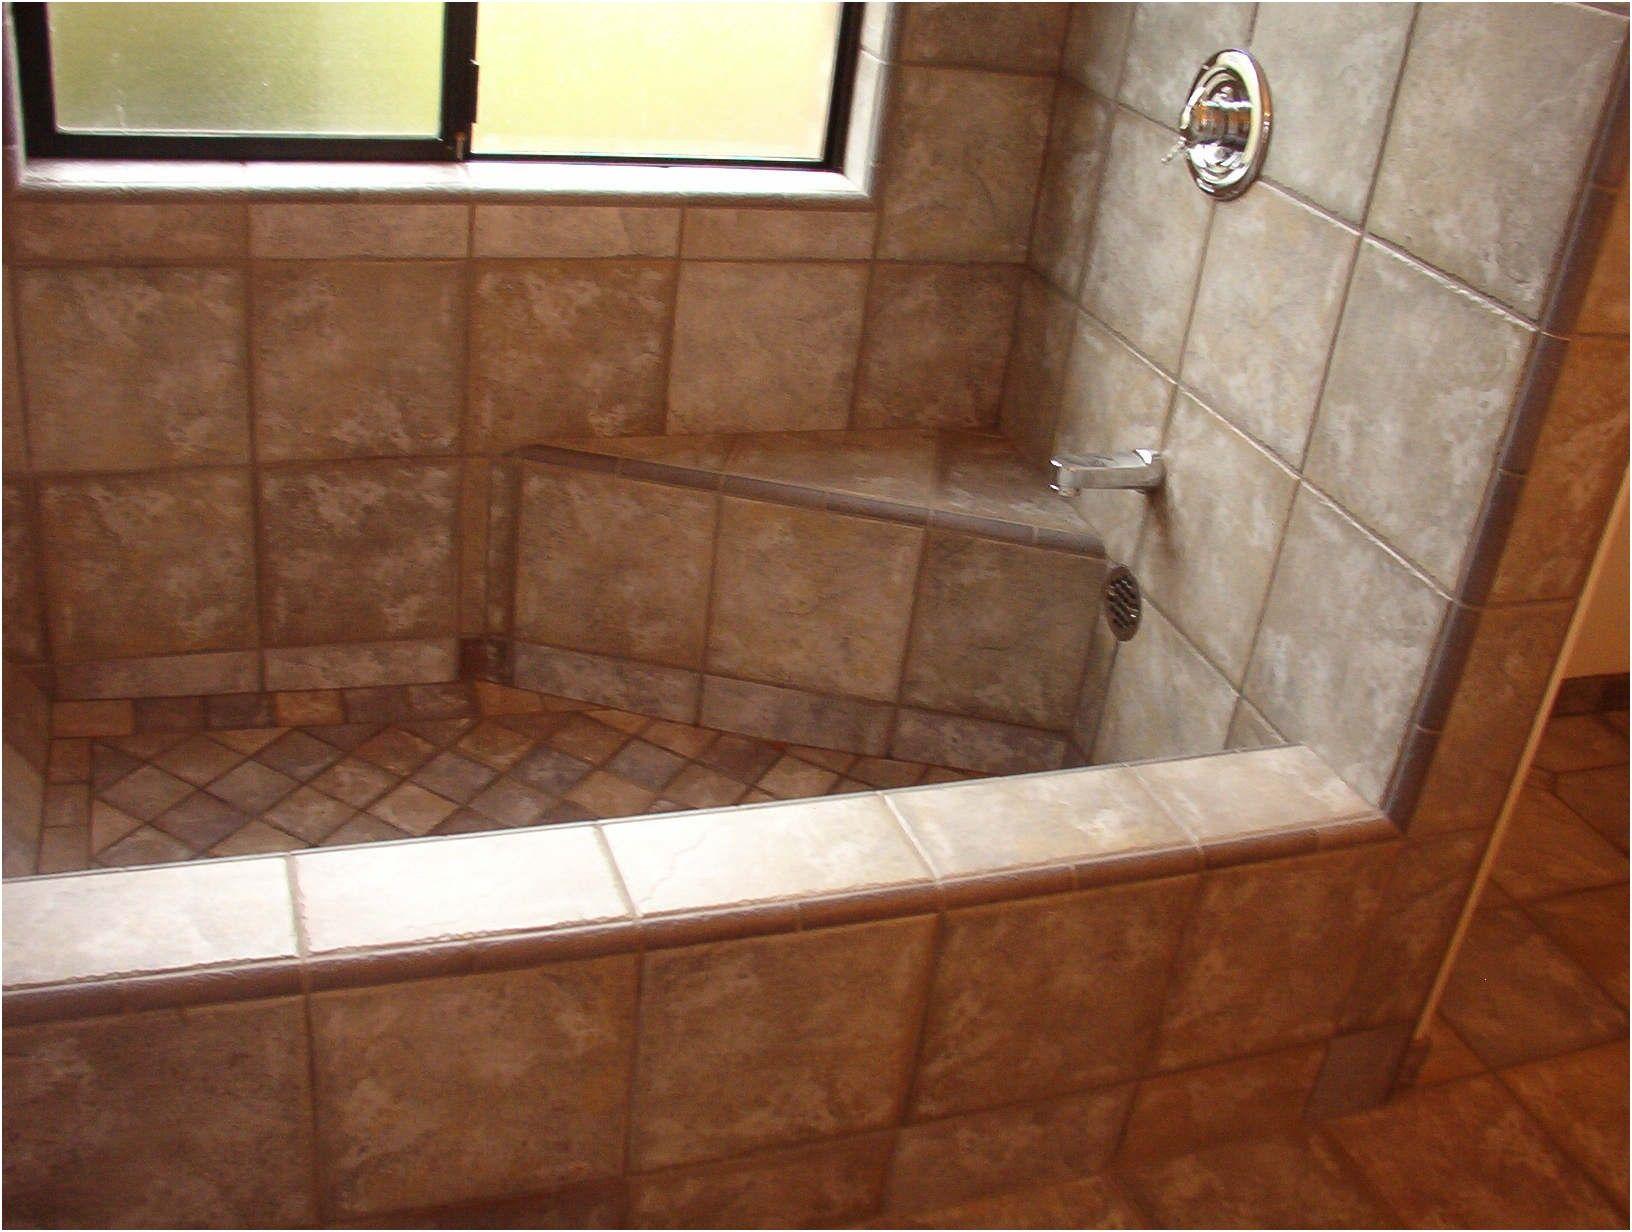 Colorful Roman Bath Tubs Sketch - Sink Faucet Ideas - nokton.info